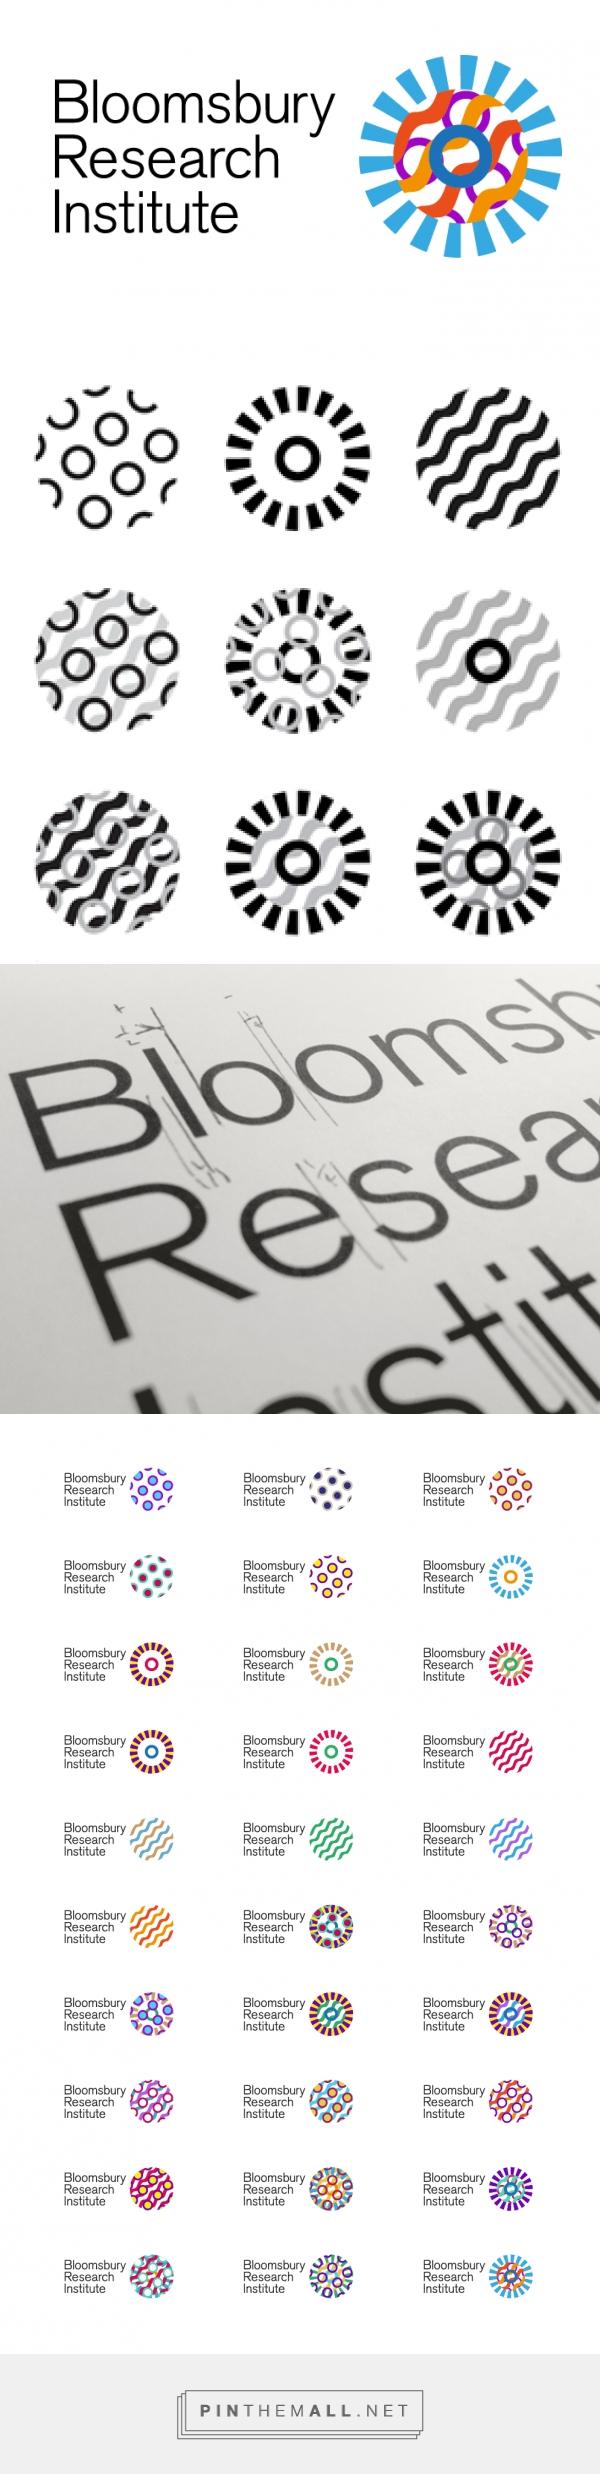 Igloo | Portfolio | Identities | Bloomsbury Research Institute - created via http://pinthemall.net